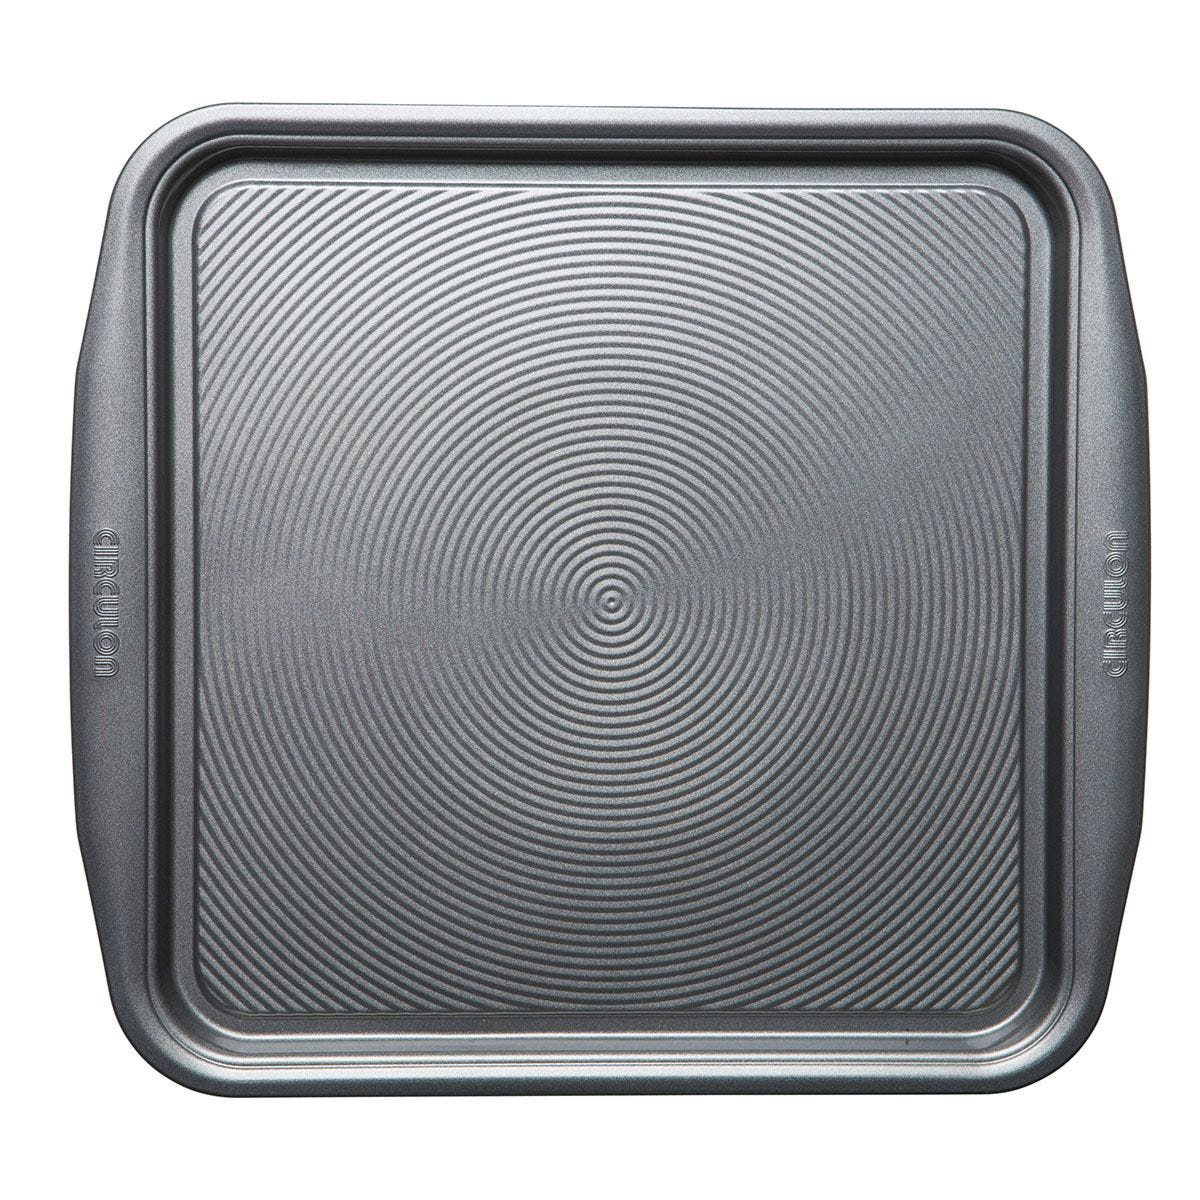 Circulon 9 Inch Square Cake Tin